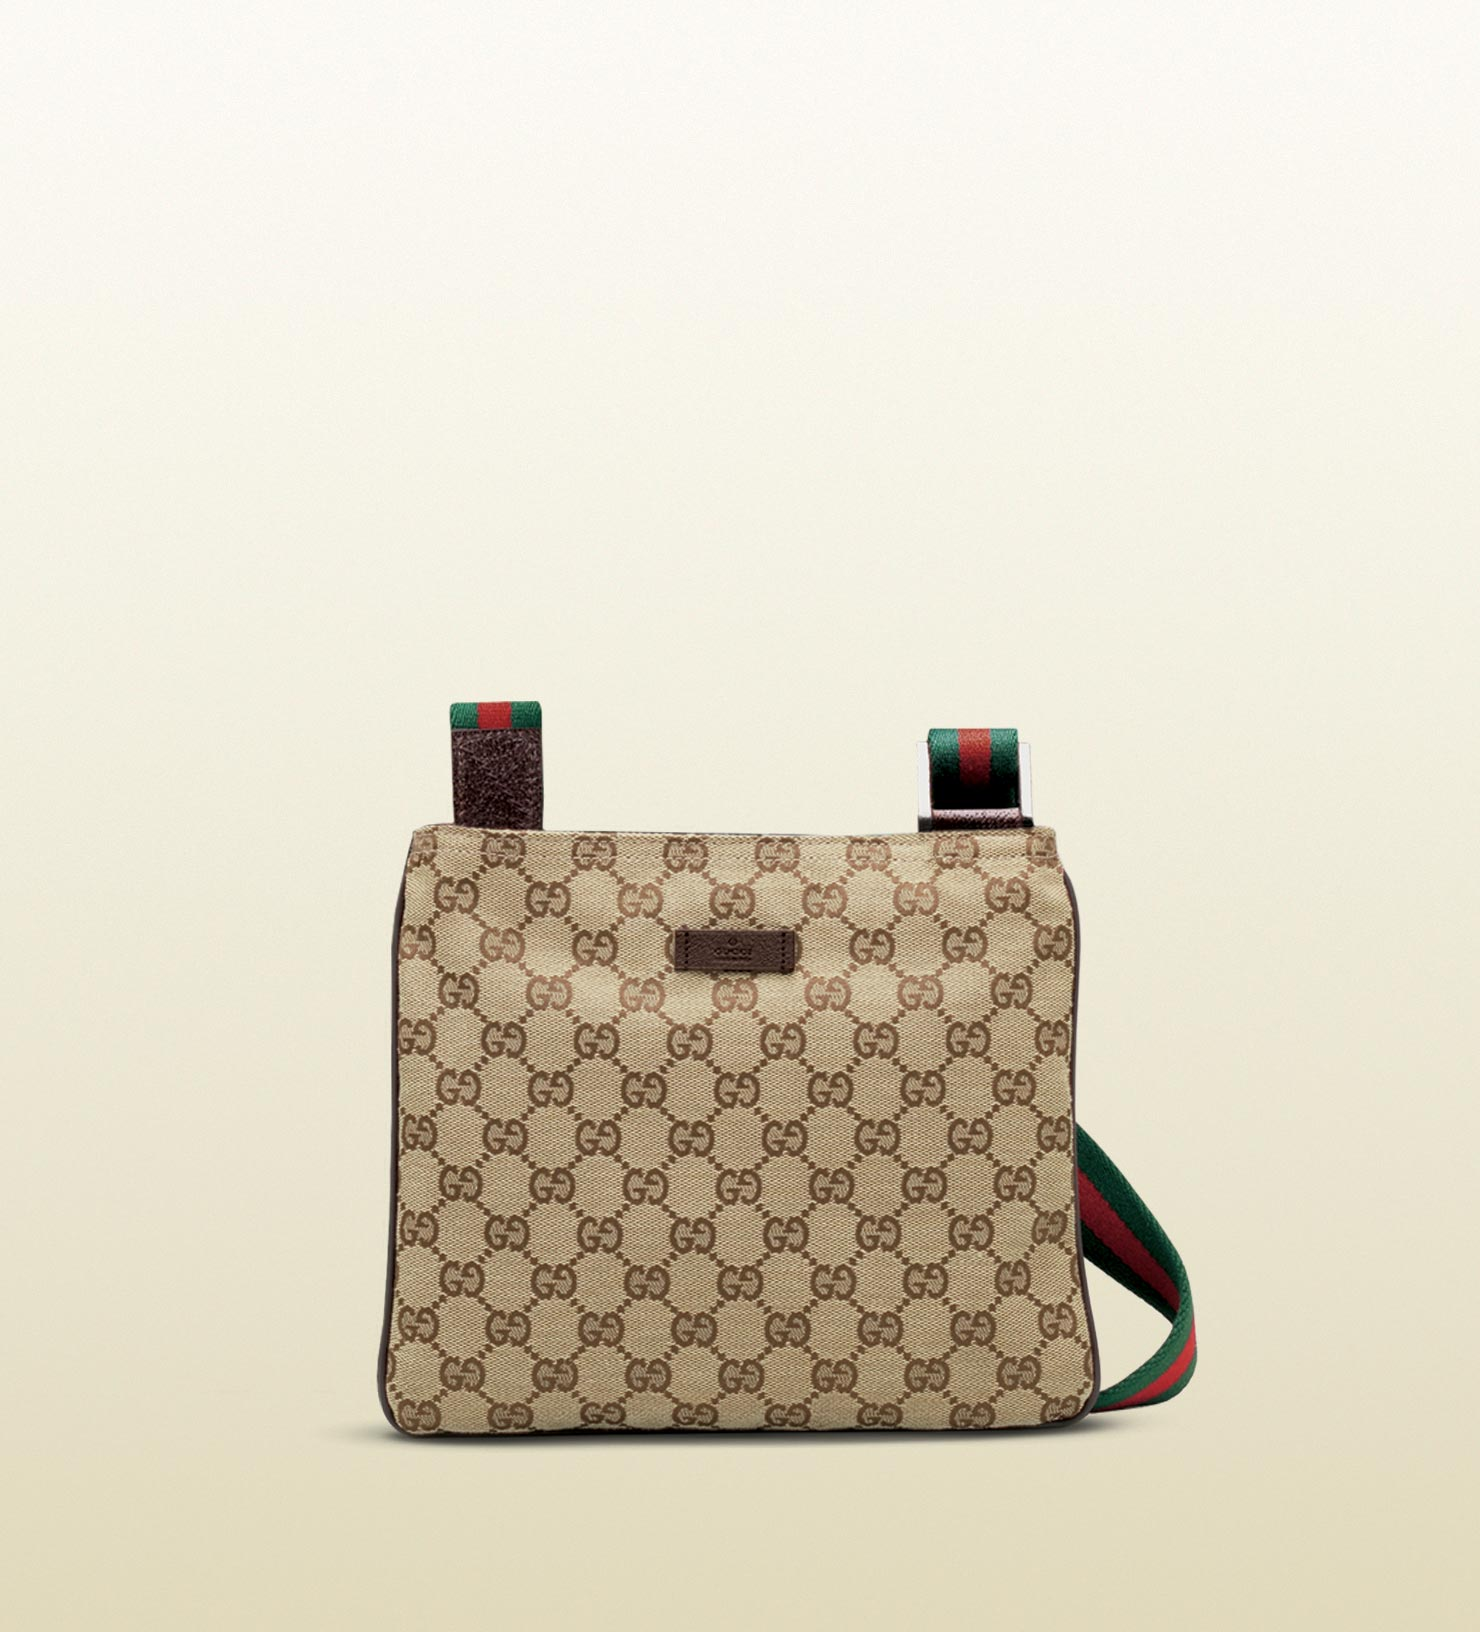 74c58b0c267d Gucci Original Gg Canvas Messenger Bag in Natural for Men - Lyst